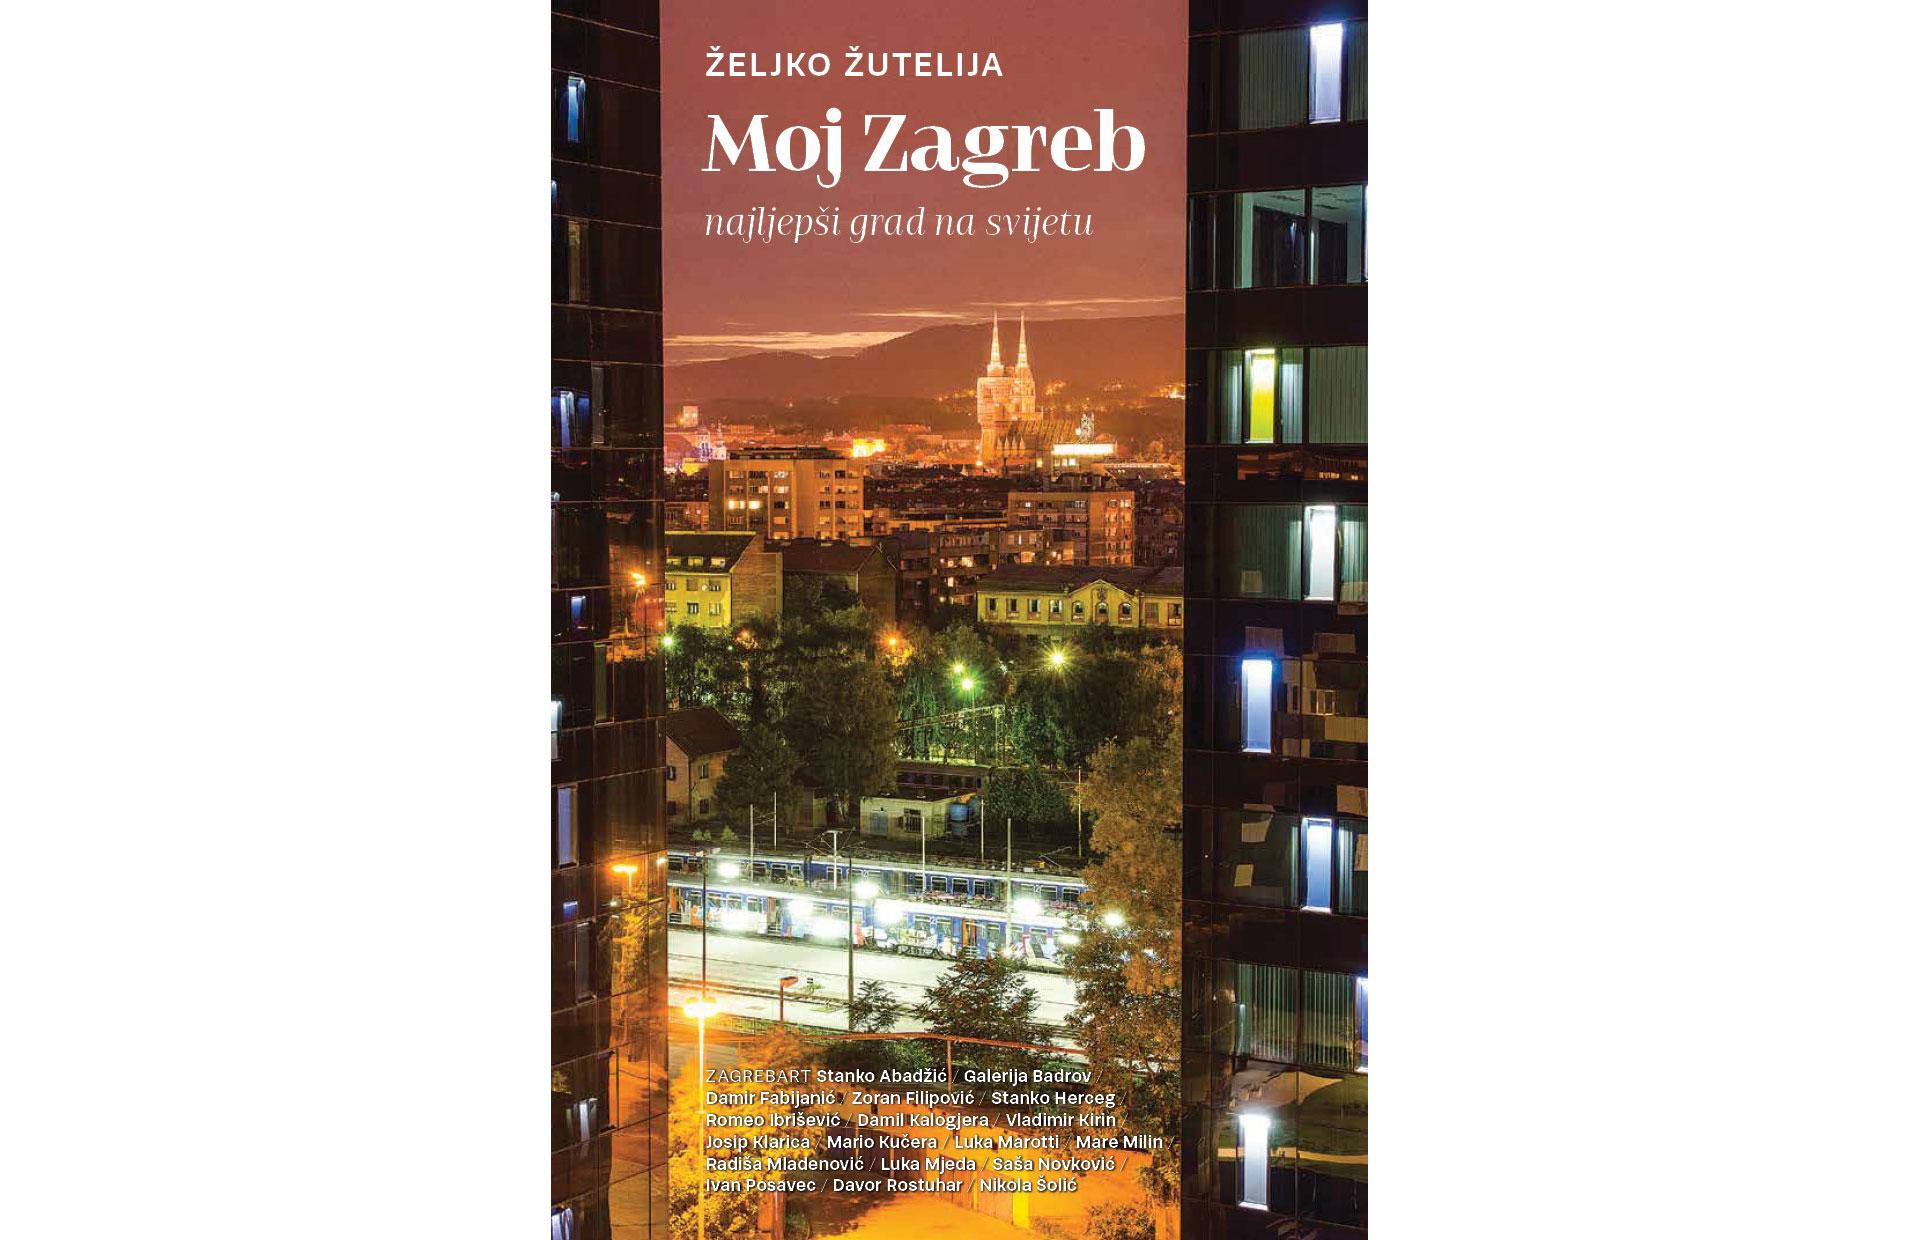 Moj Zagreb - Željko Žutelija